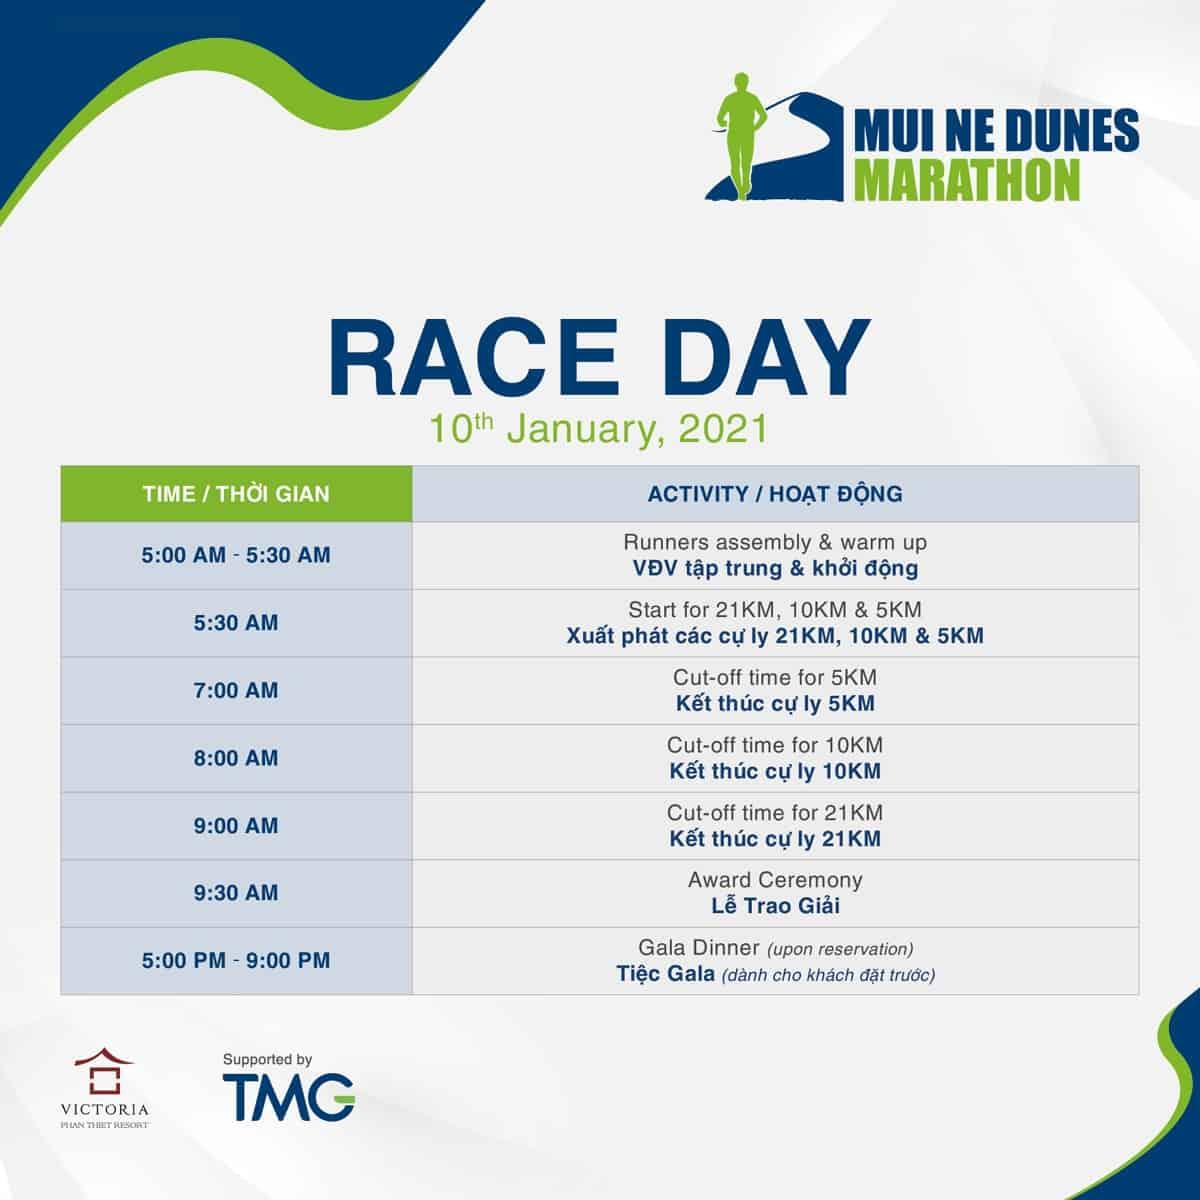 Race Day của Mui Ne Dunes Marathon